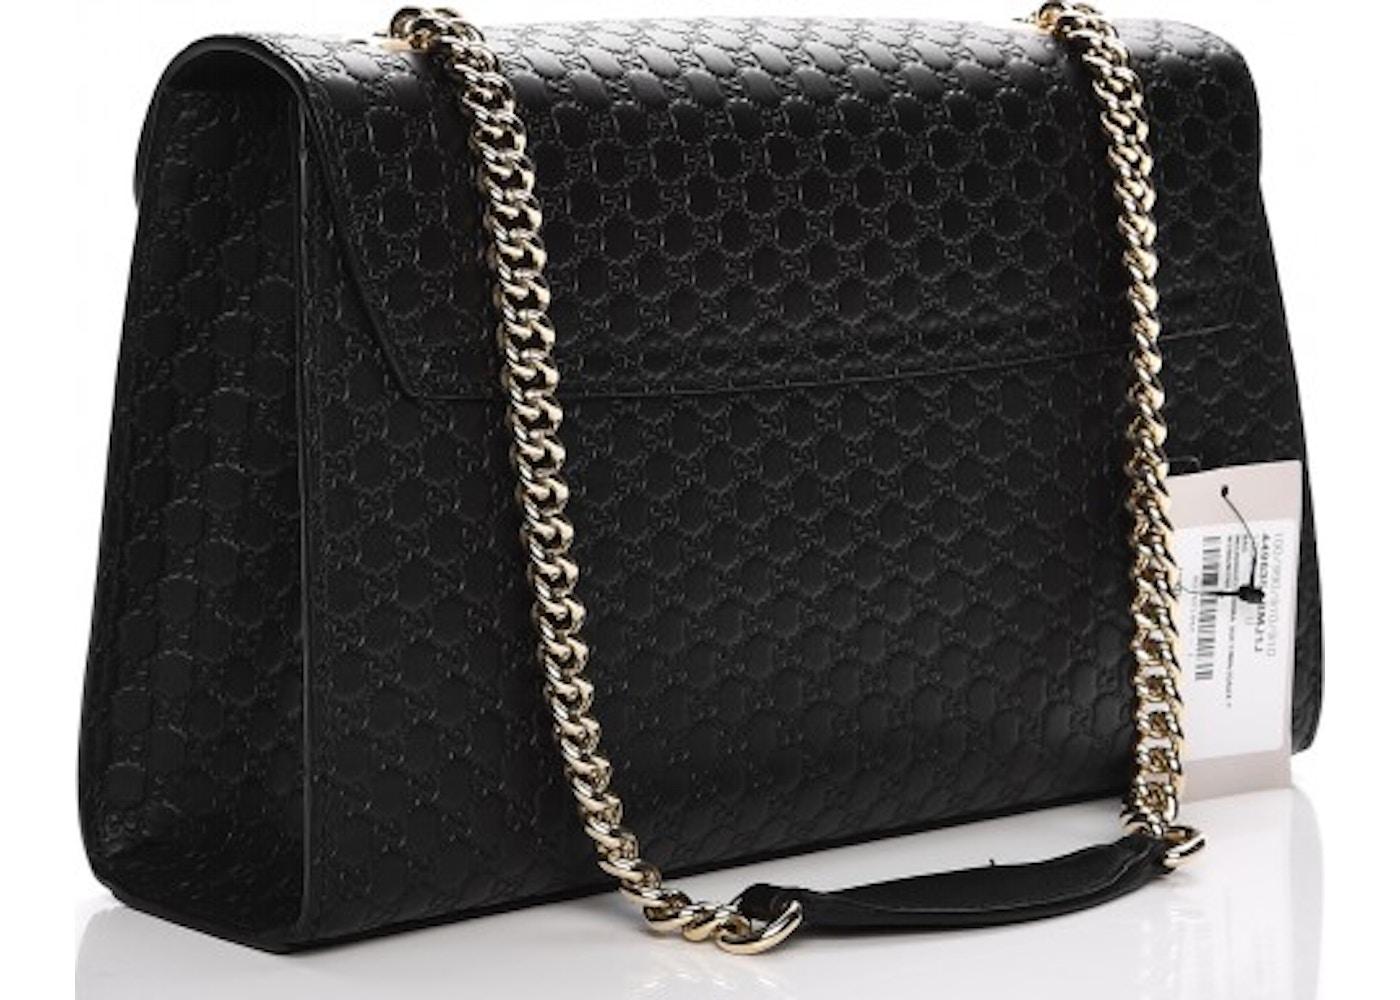 3492b7de9f6b Gucci Emily Chain Shoulder Bag Monogram Microguccissima Black